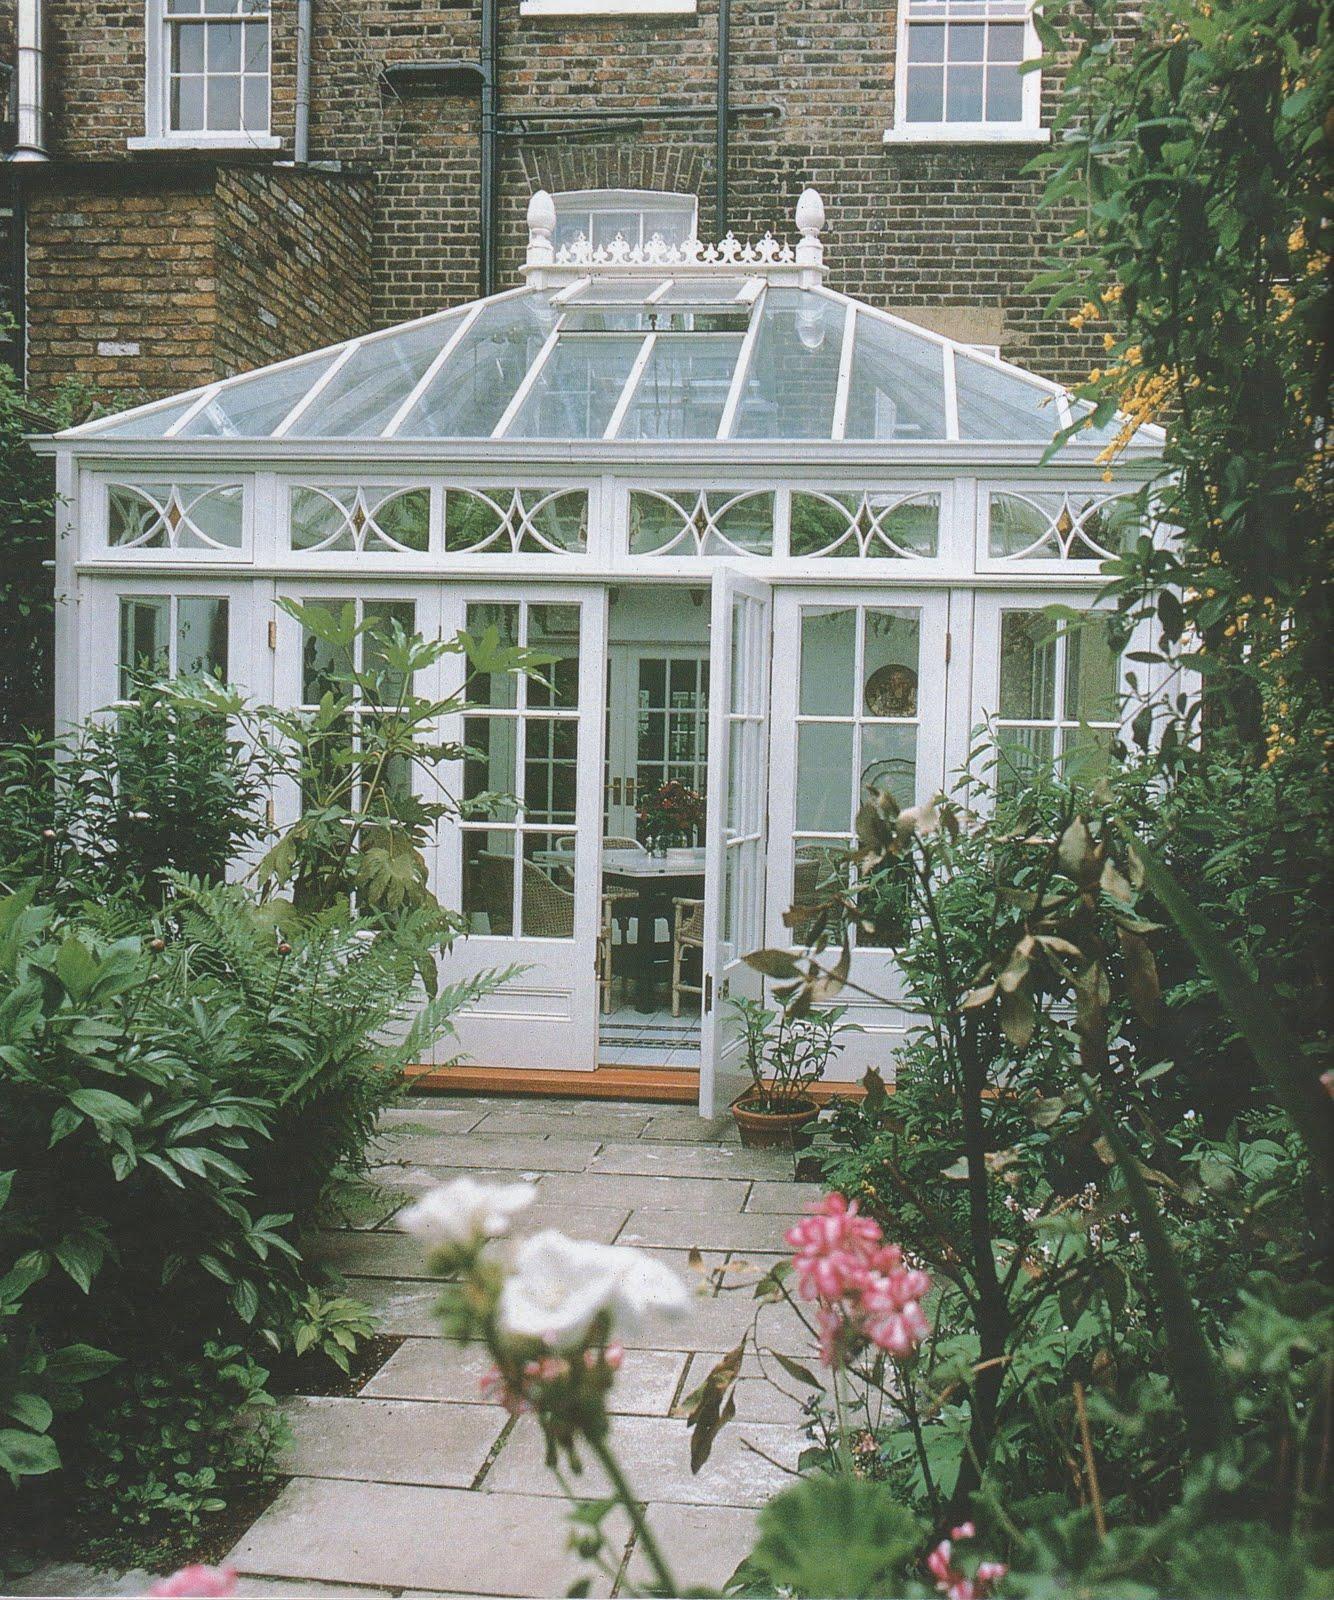 Futuristic Victorian Front Gardens 9 On Garden Design: Victorian Literature: A Victorian House